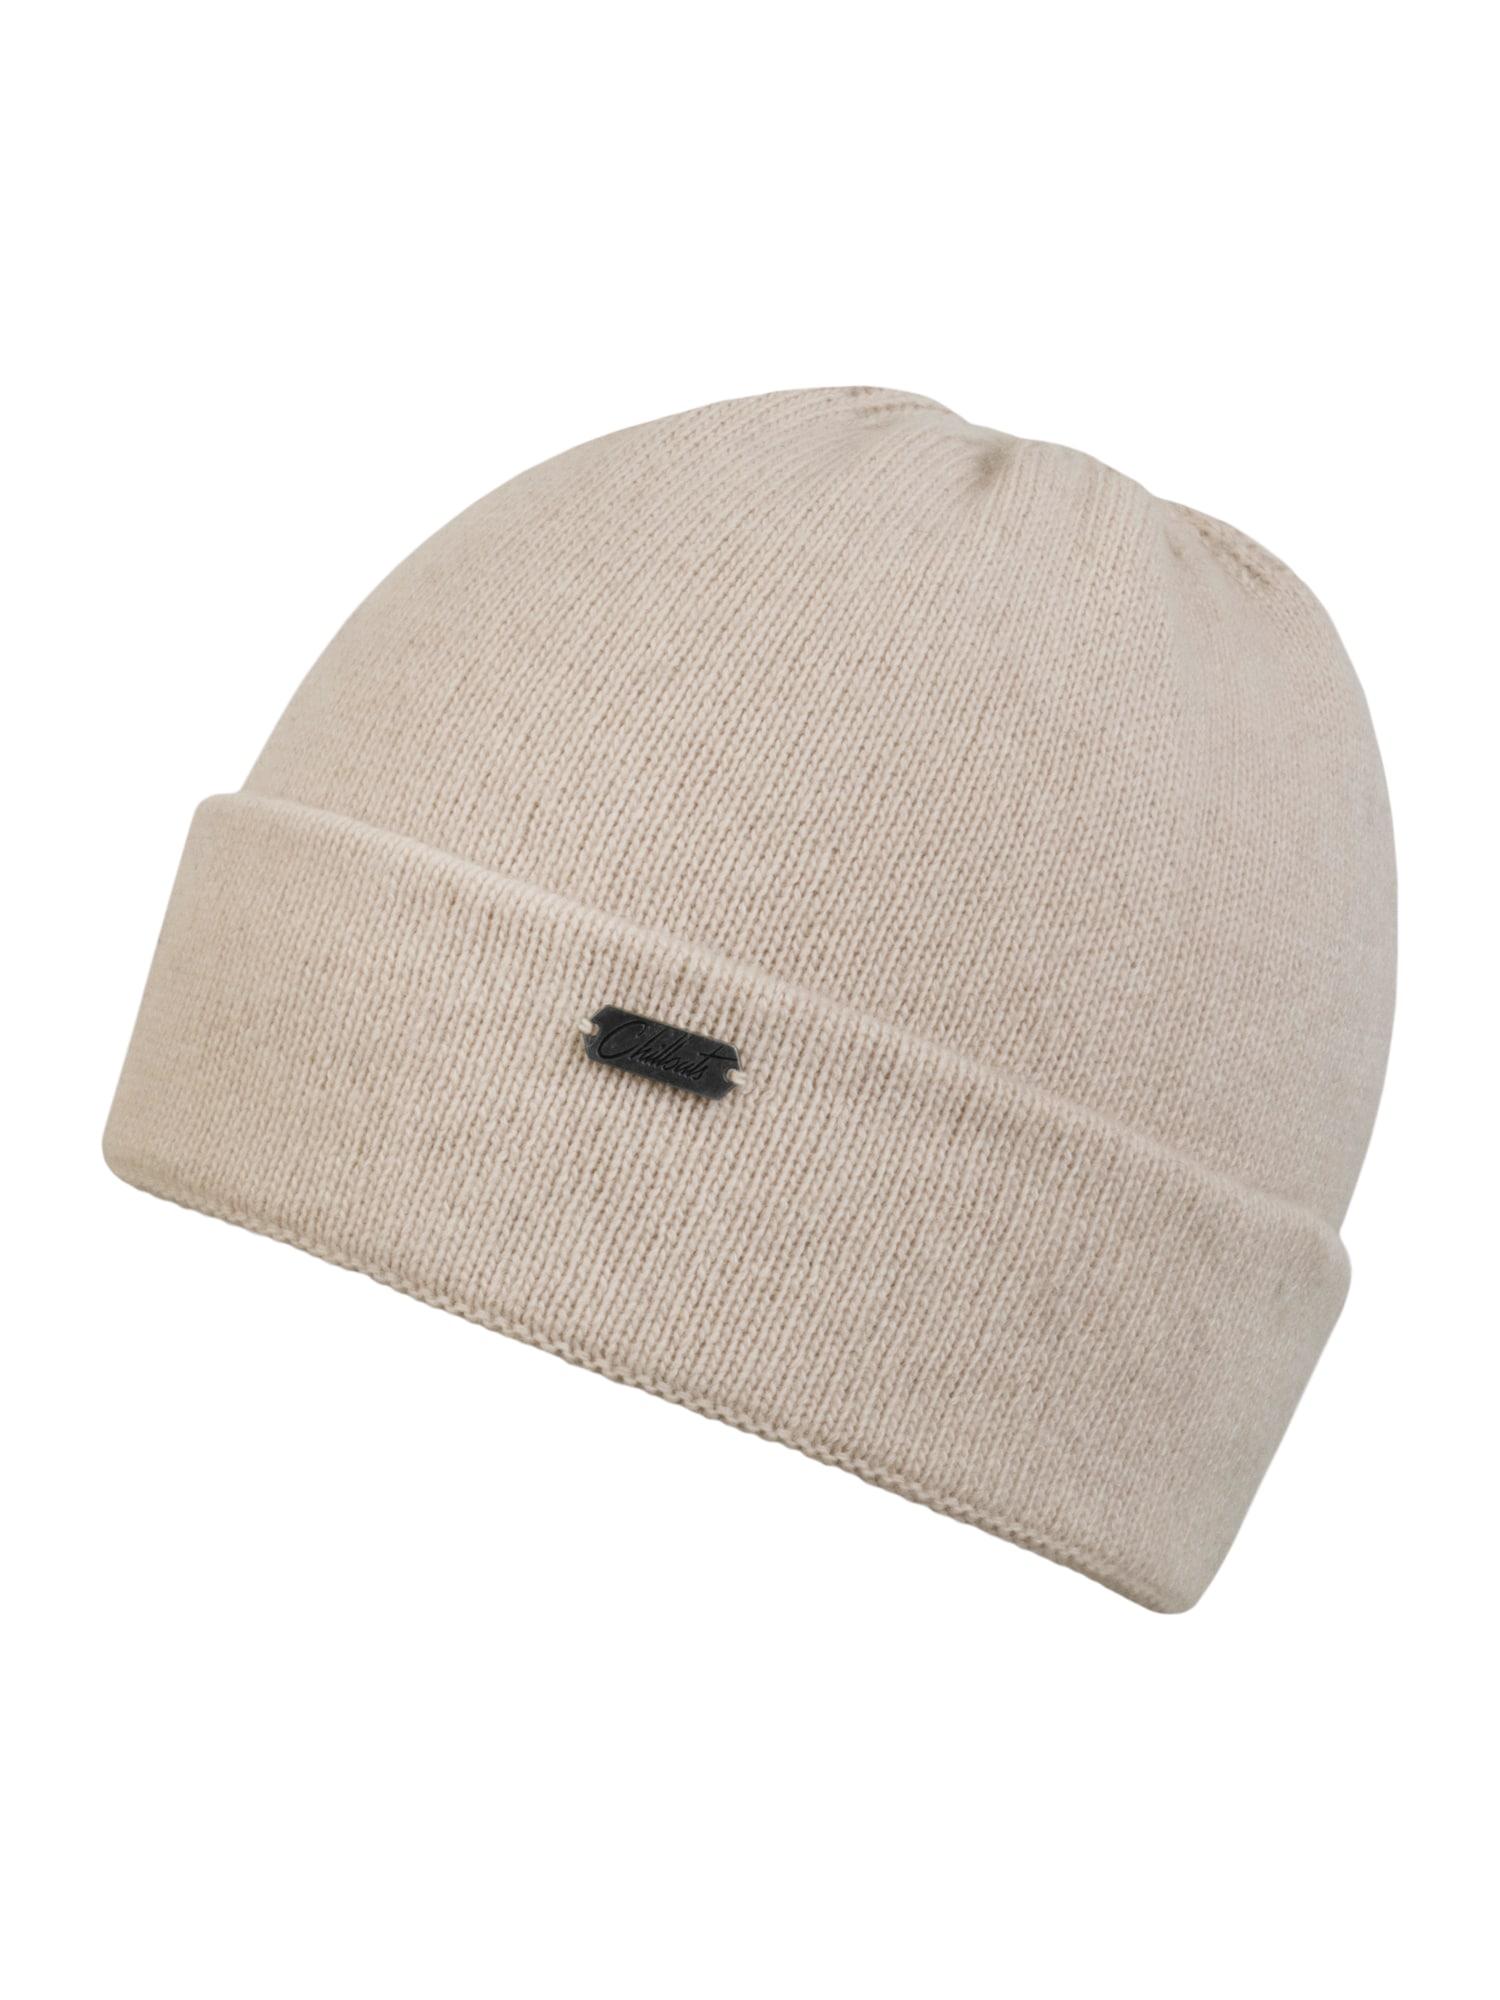 chillouts Megzta kepurė 'Marvin' smėlio